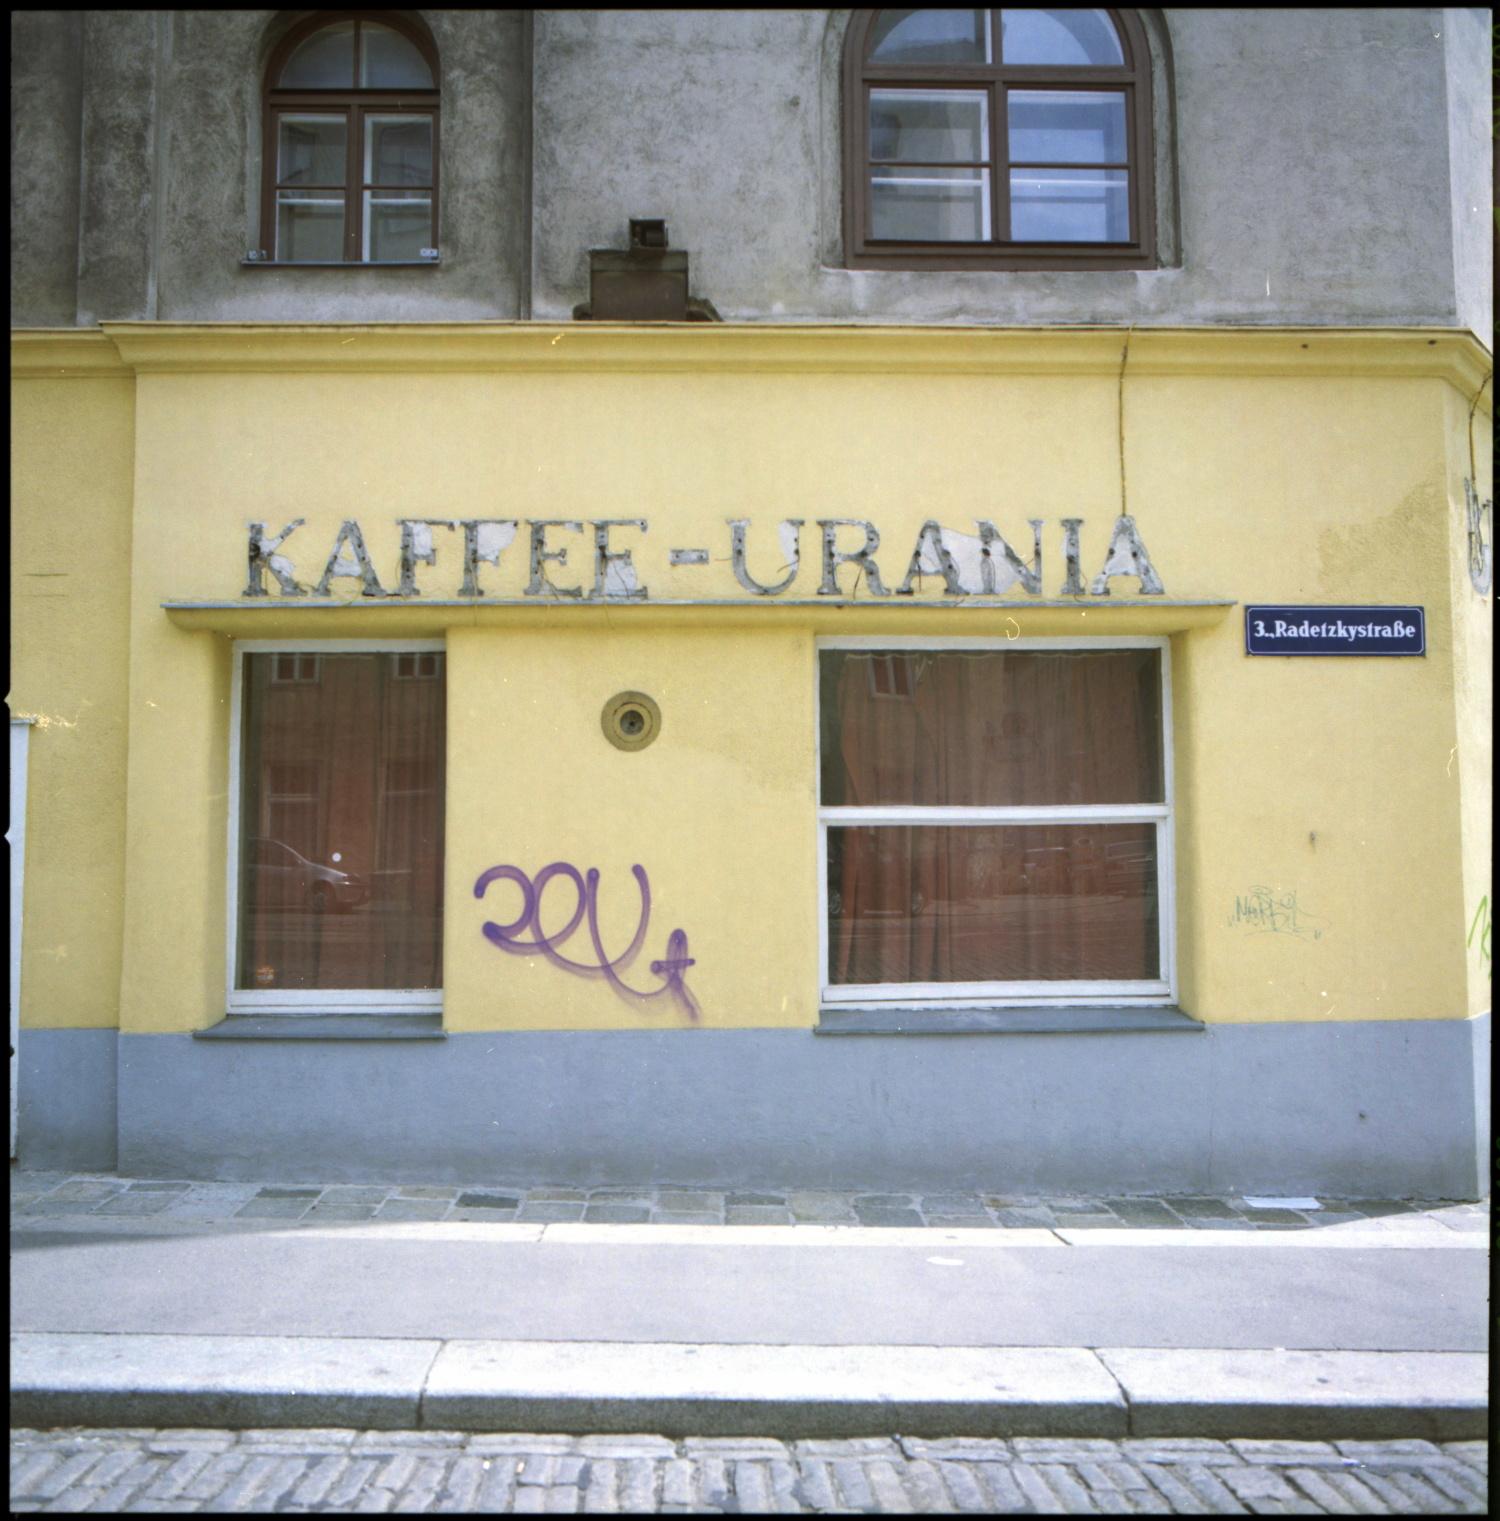 Kaffeehaus Urania